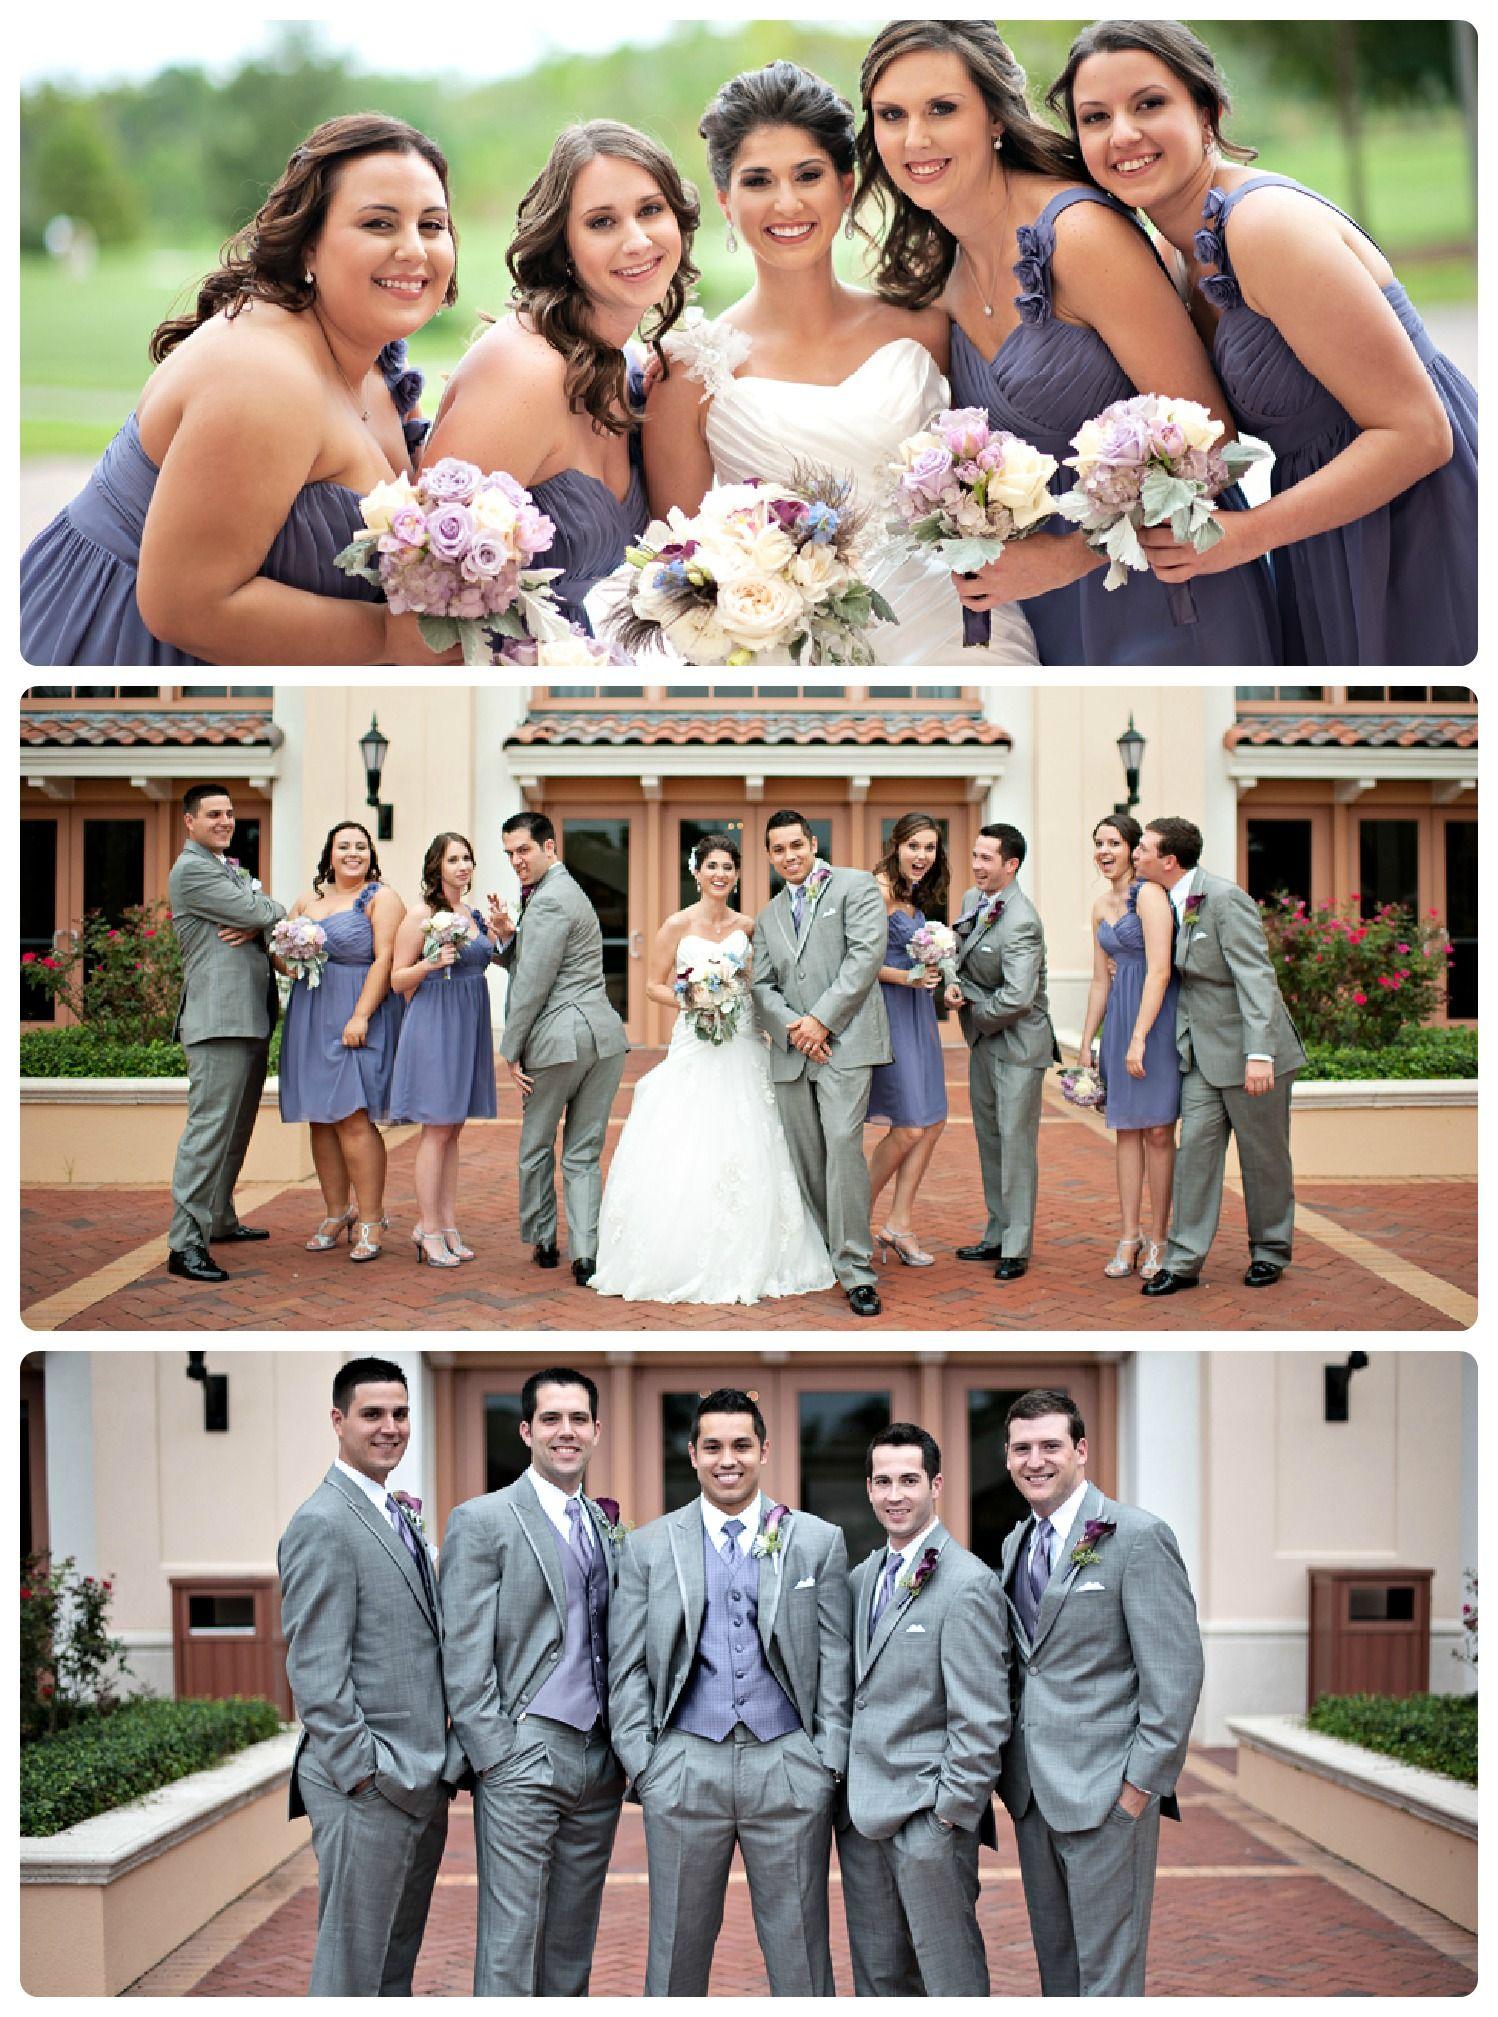 Orlando weddings rosen shingle creek purple bridesmaid dresses orlando weddings rosen shingle creek purple bridesmaid dresses periwinkle bridesmaid dresses a ombrellifo Images